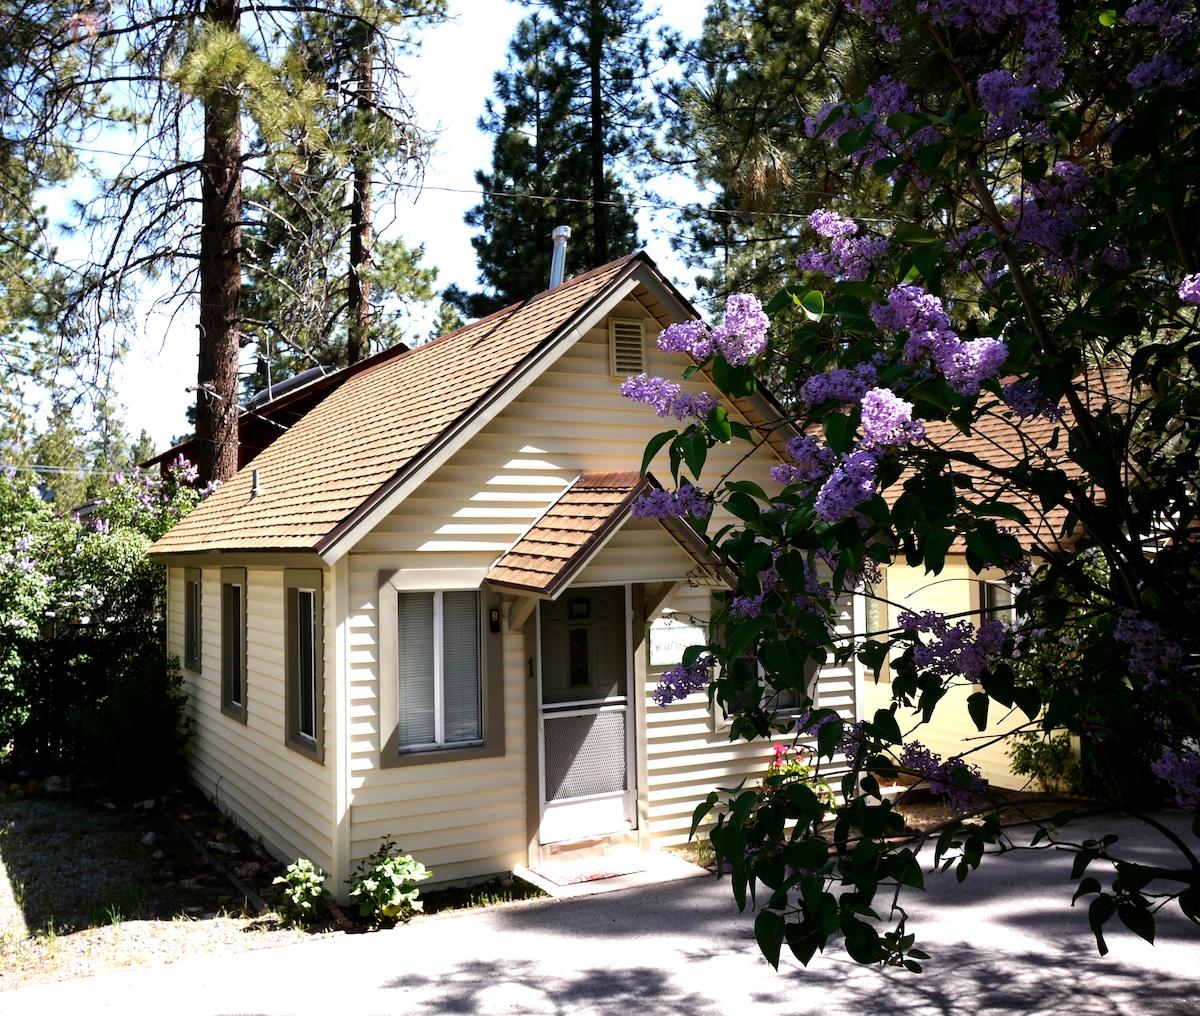 Cozy Big Bear Cabin - Wild Flower